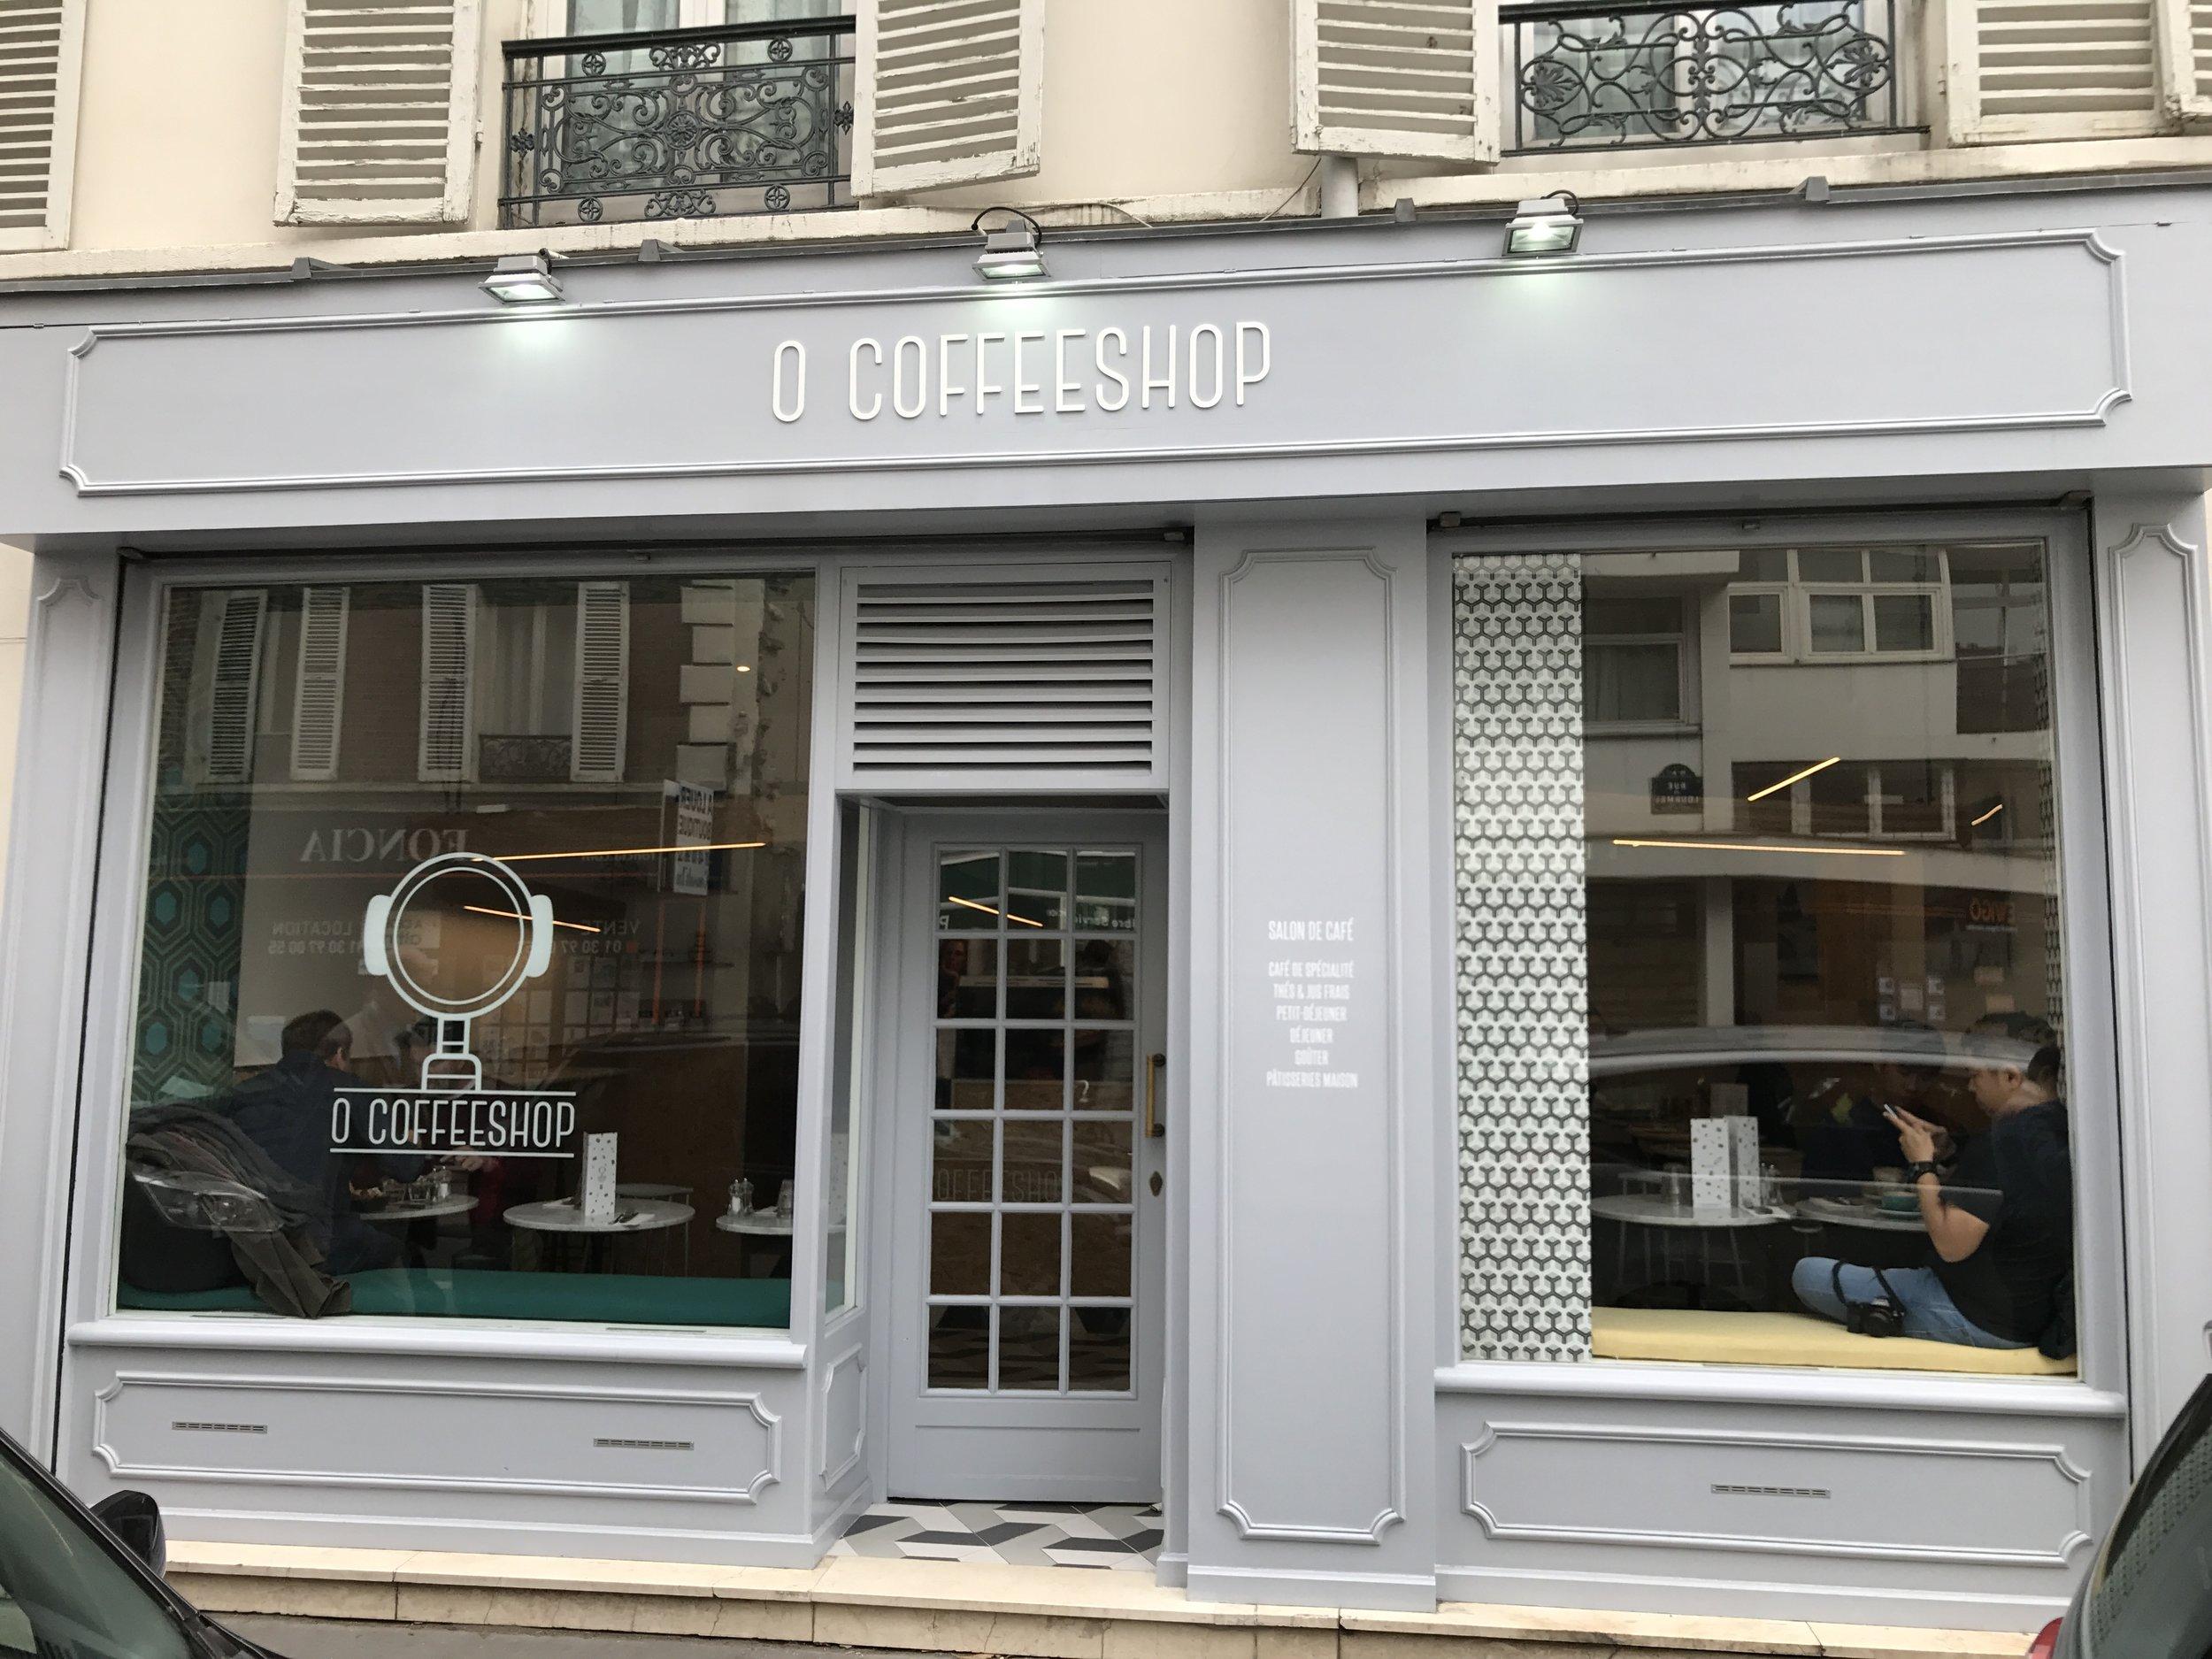 O Coffeeshop - great place!